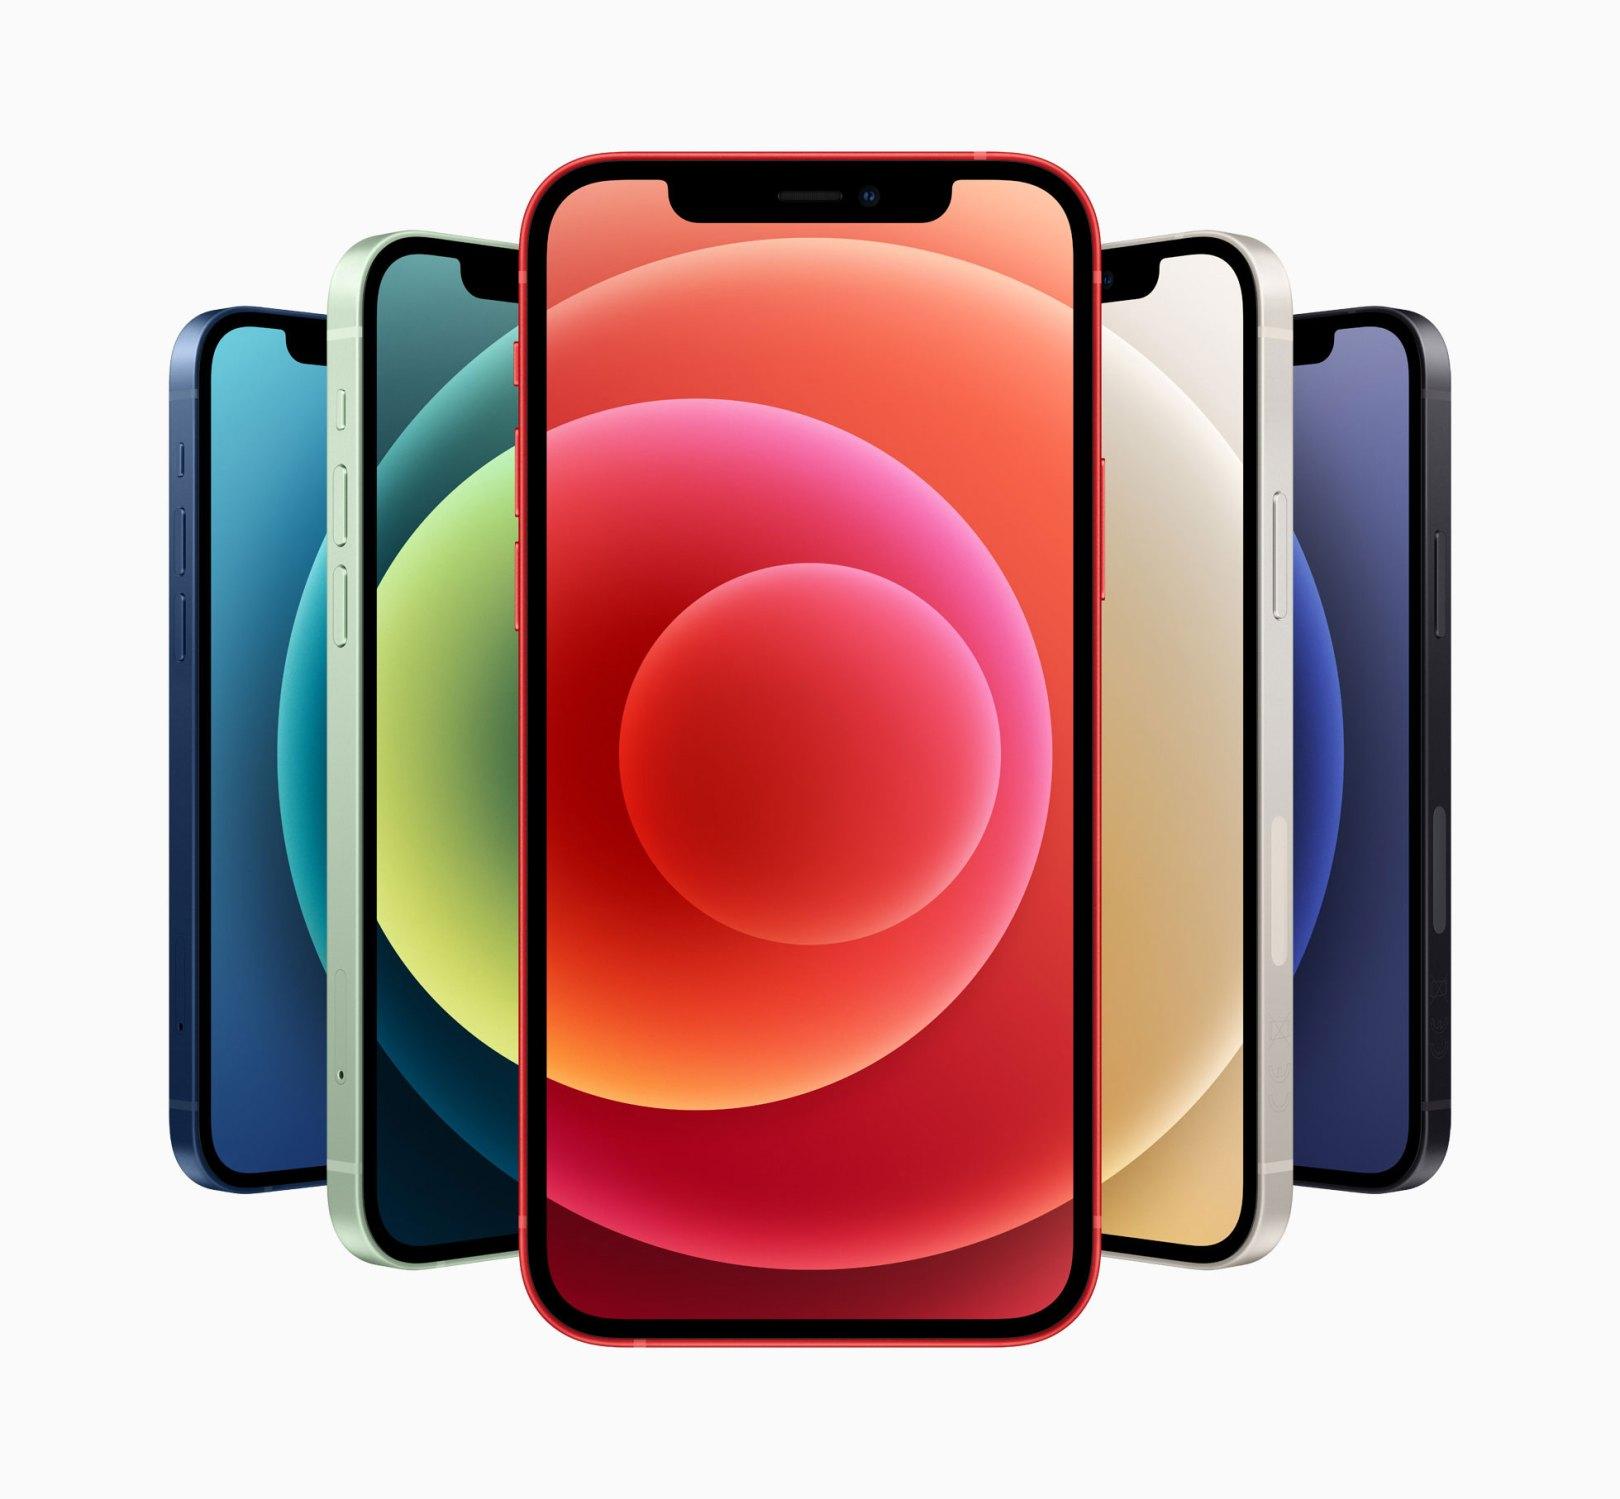 iphone 12 mini max pro hi speed